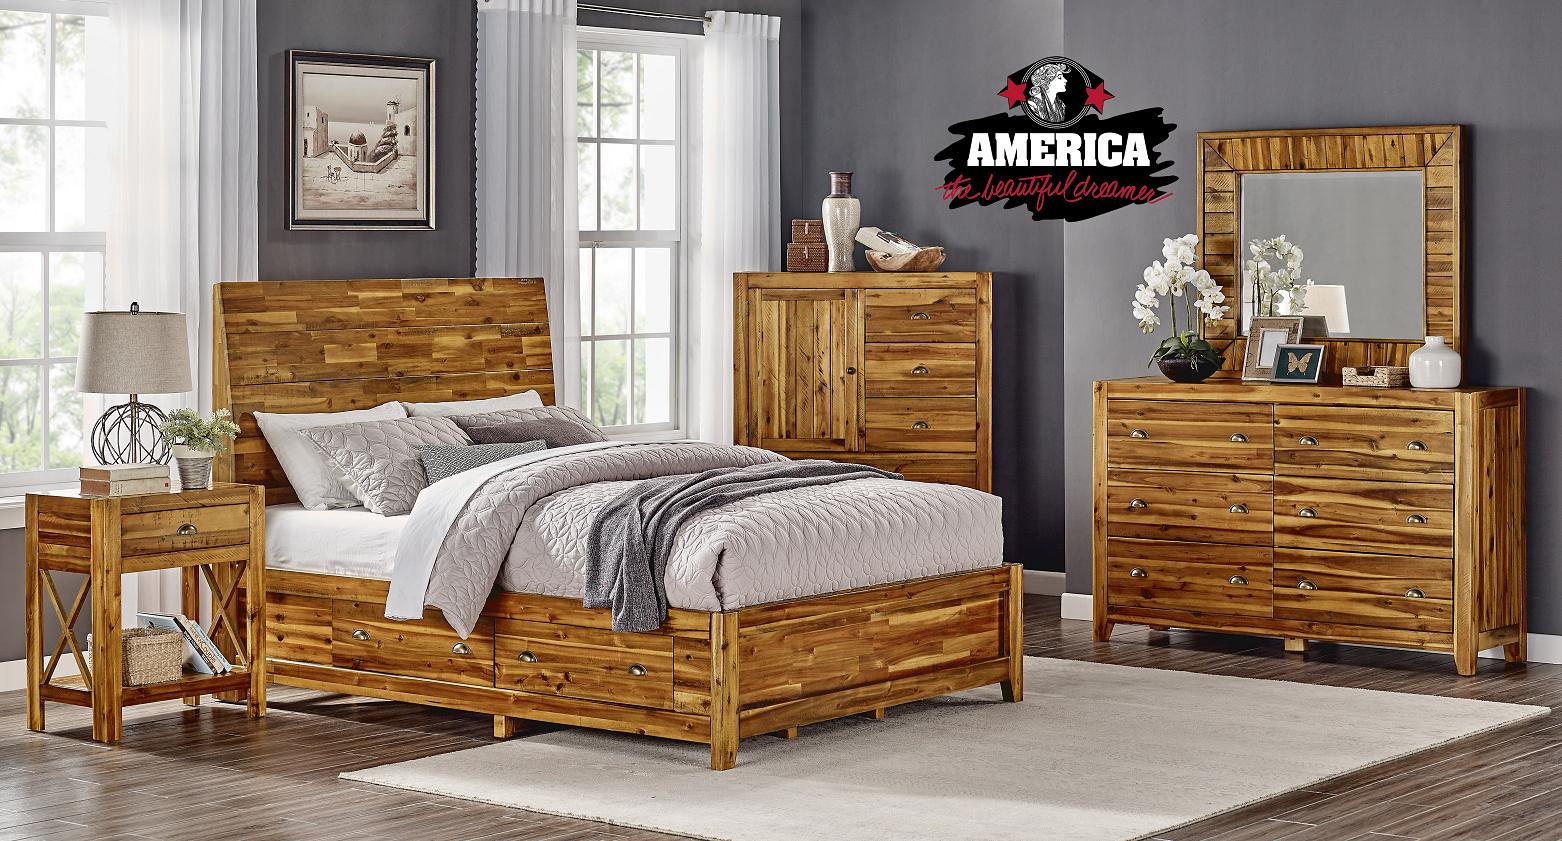 Timberline Factory Direct Furniture Store America The Beautiful Dreamer